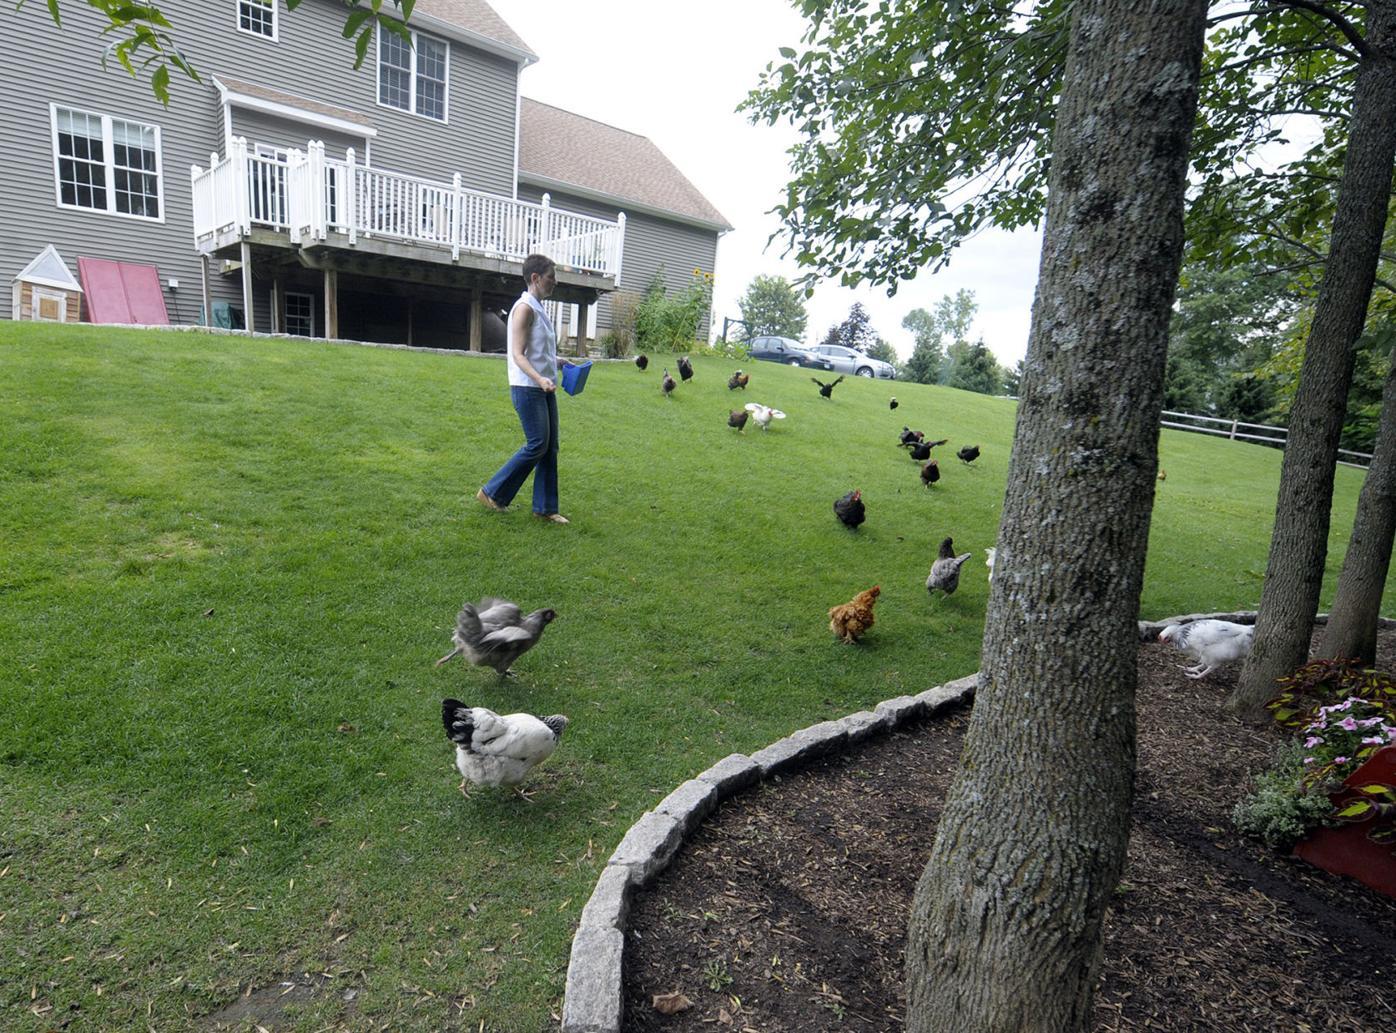 The 'Chicken Chick'